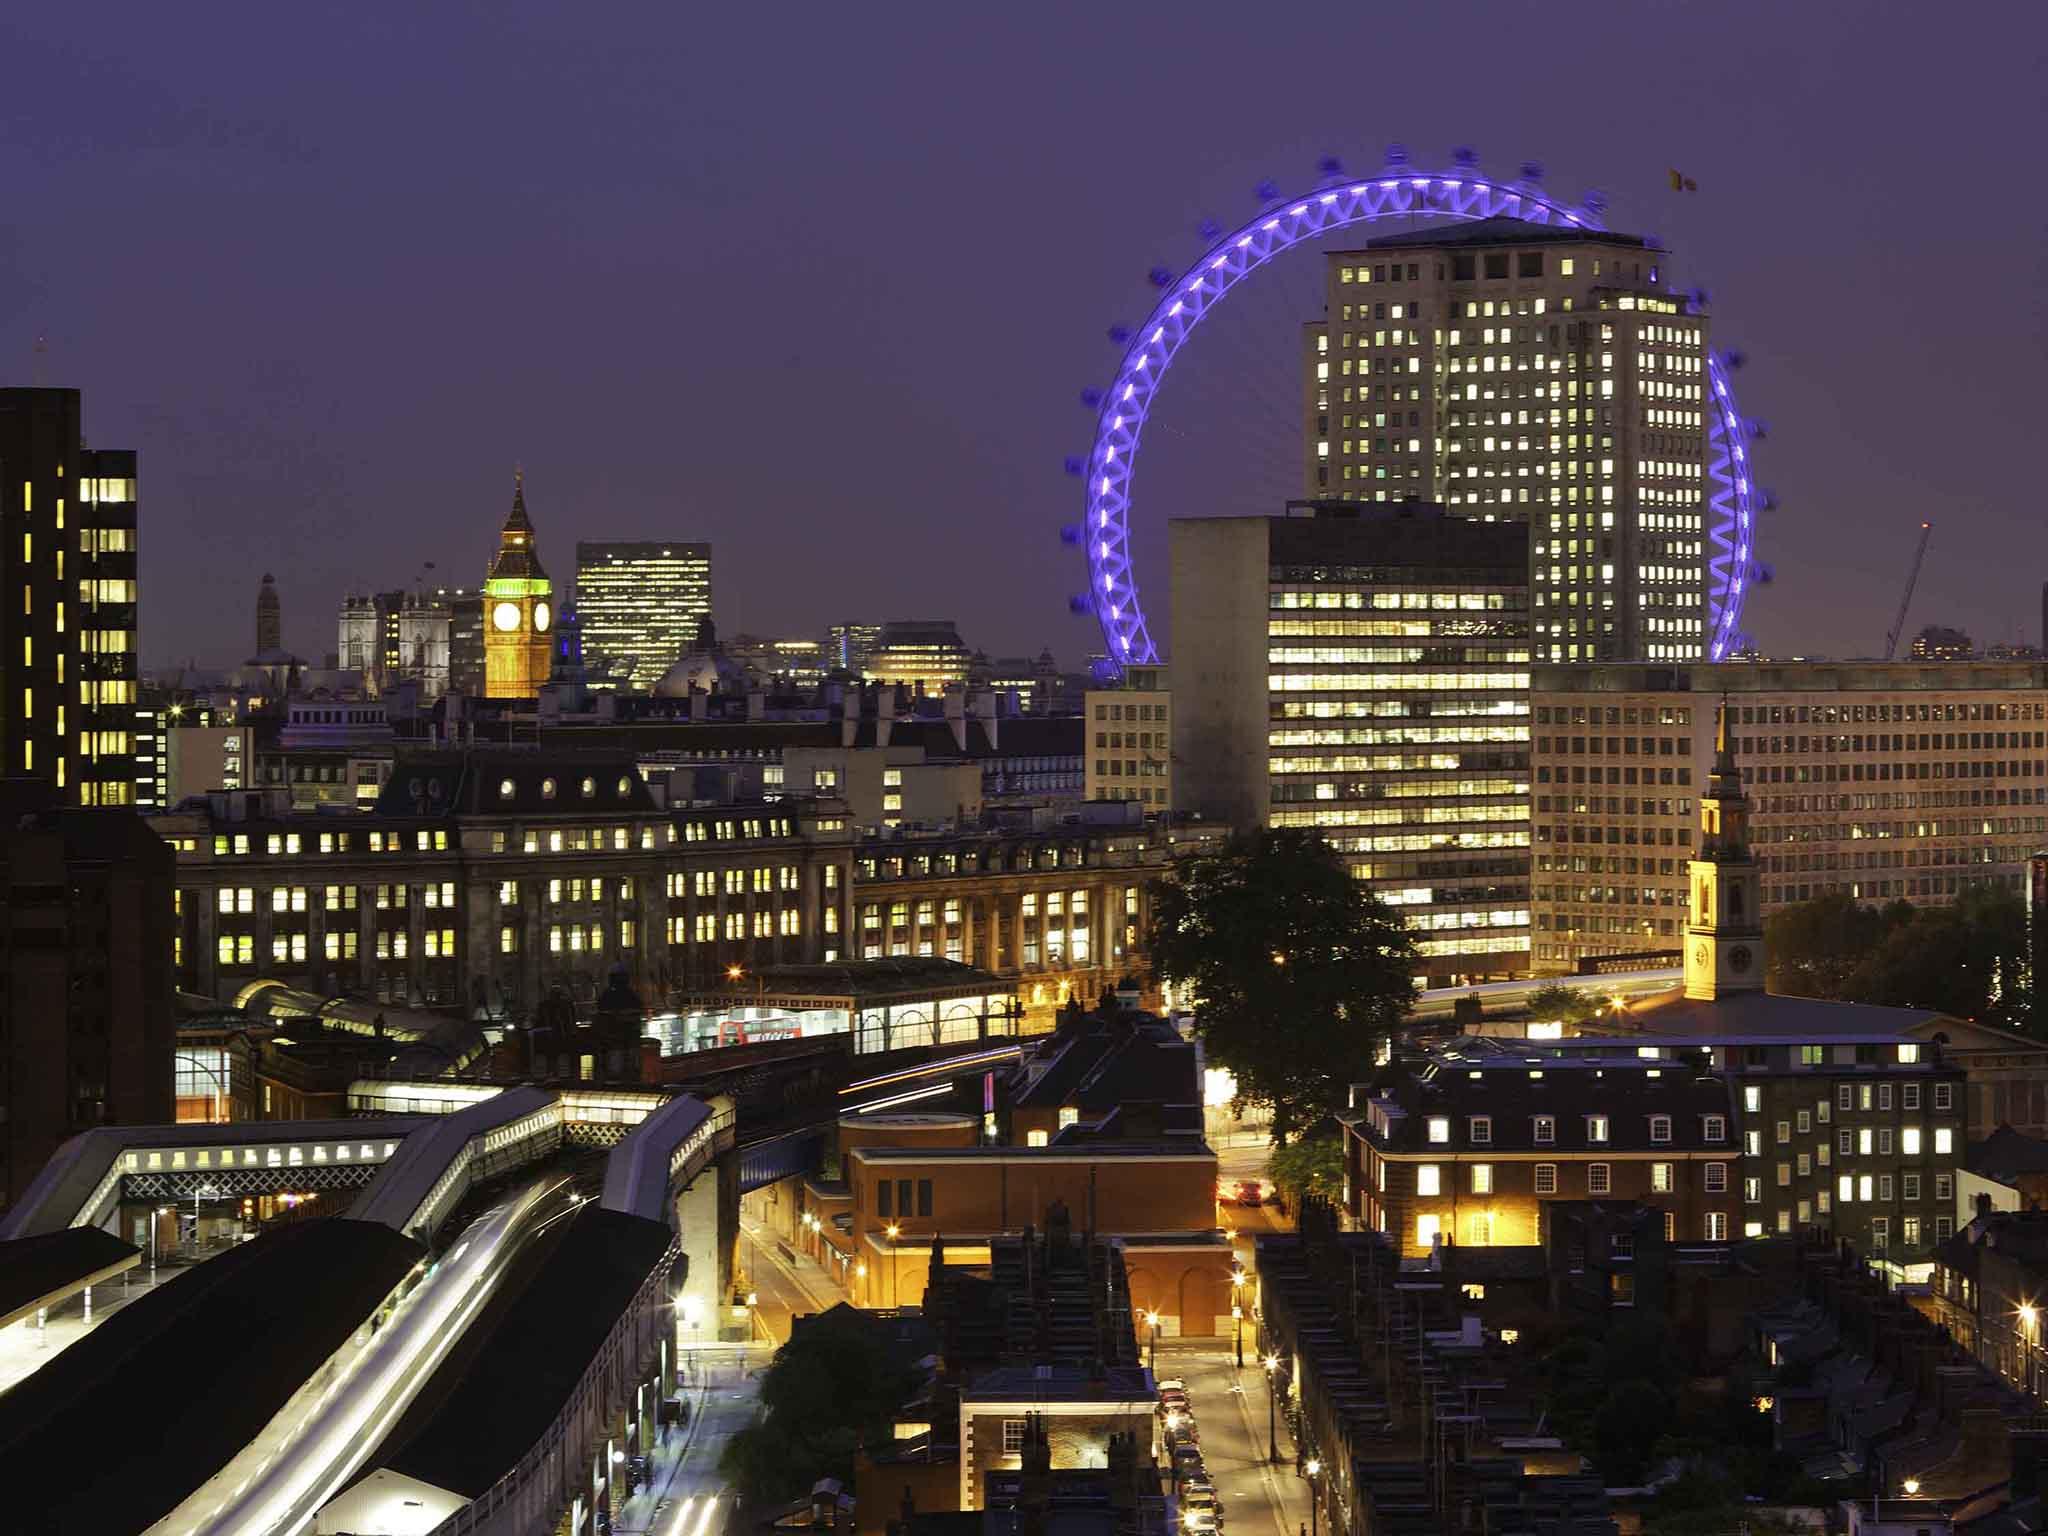 Ibis hotell london